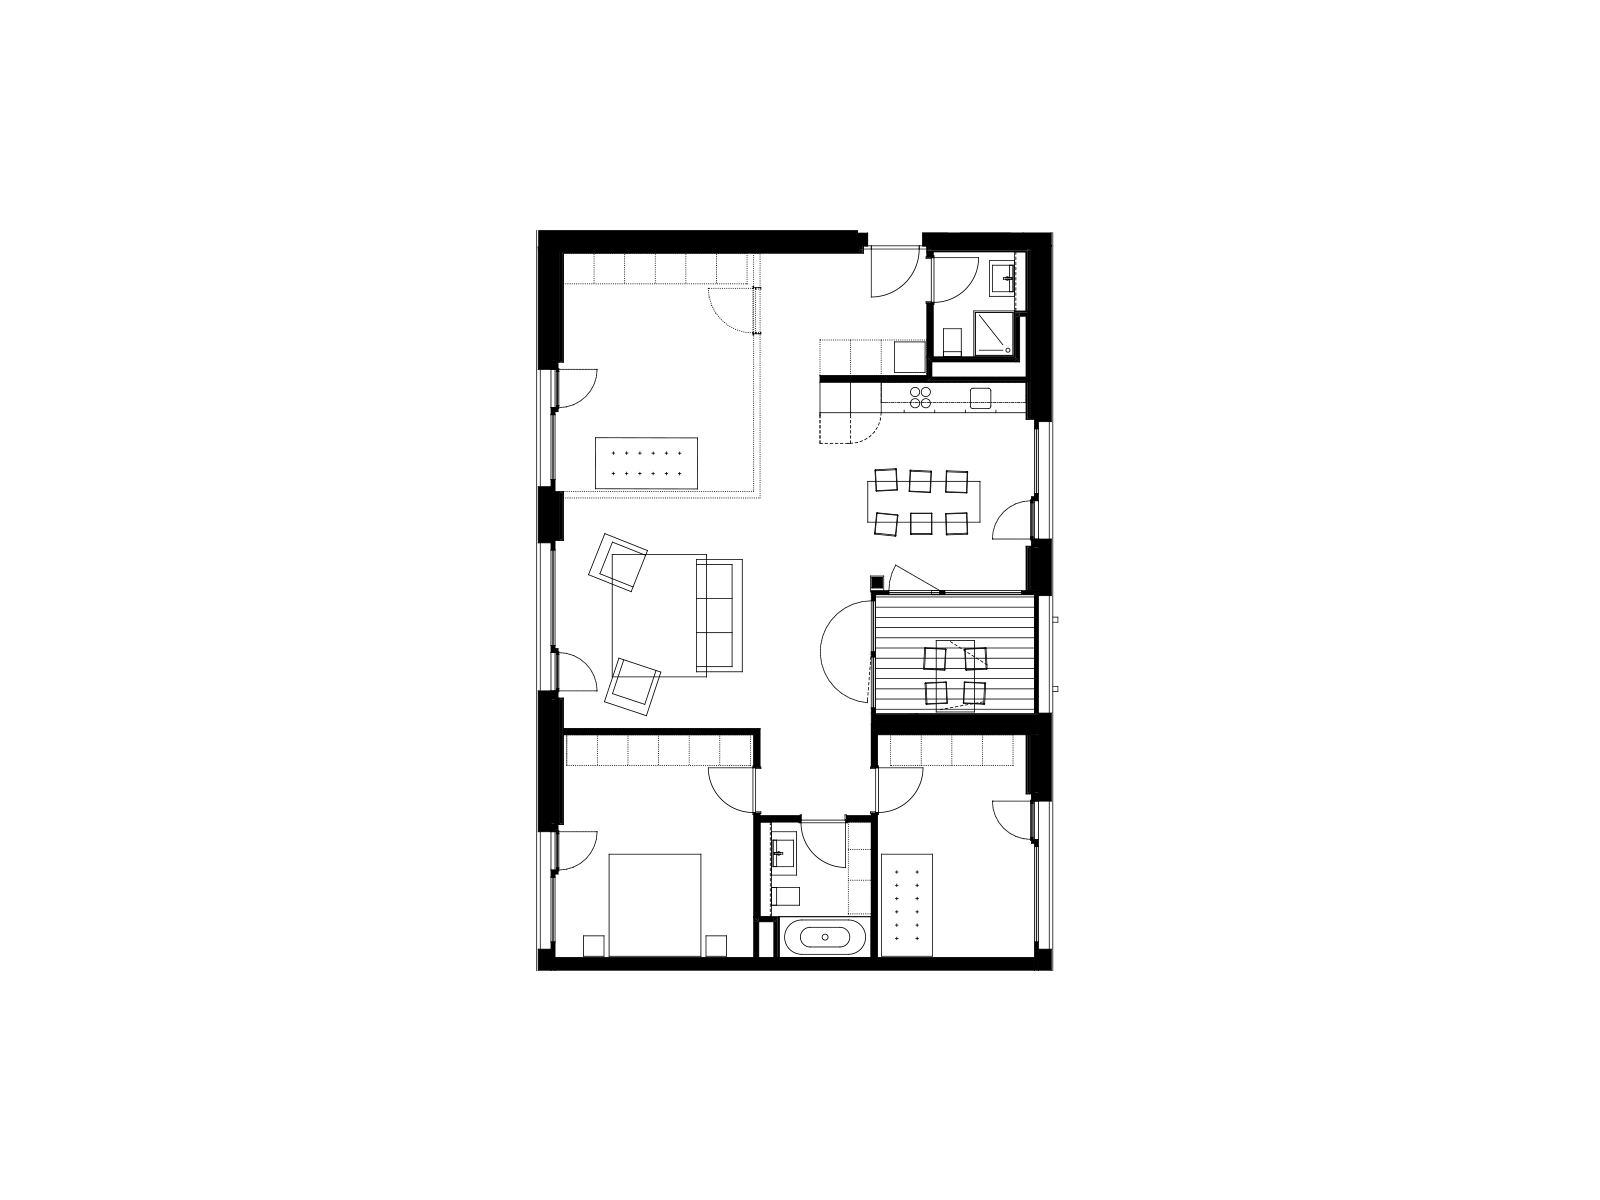 D.2.01